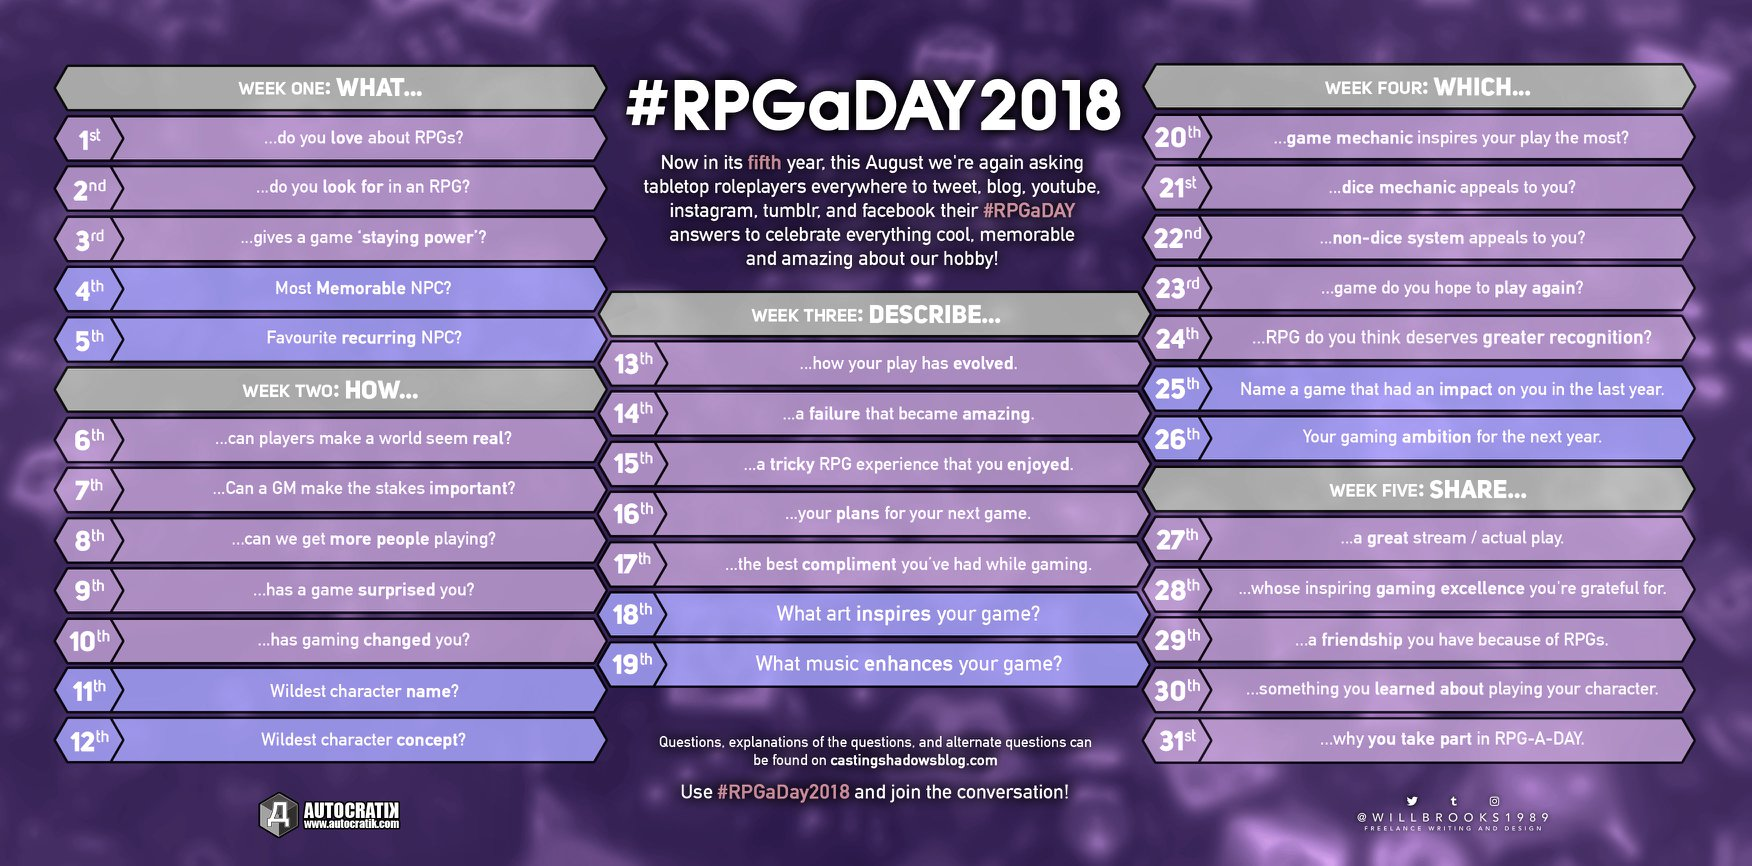 #RPGaDAY 2018 Woche 4 1